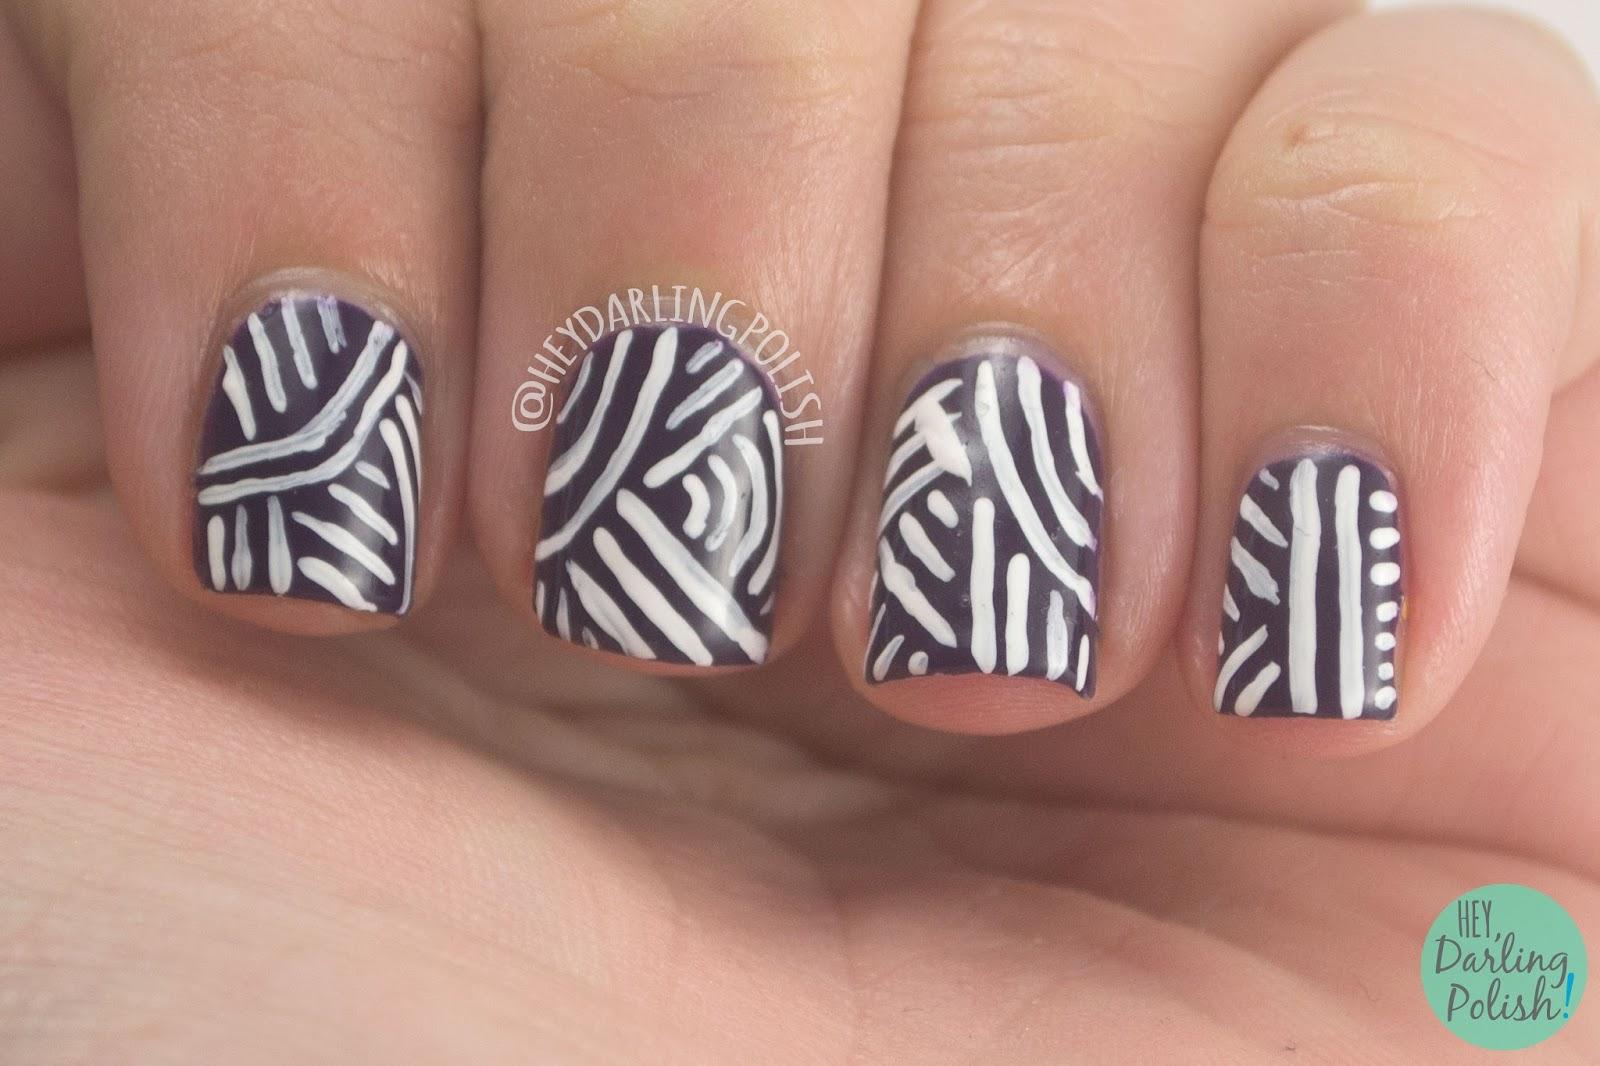 nails, nail art, nail polish, stripes, purple, lines, stripes, hey darling polish, 31 day challenge, 31dc2014,